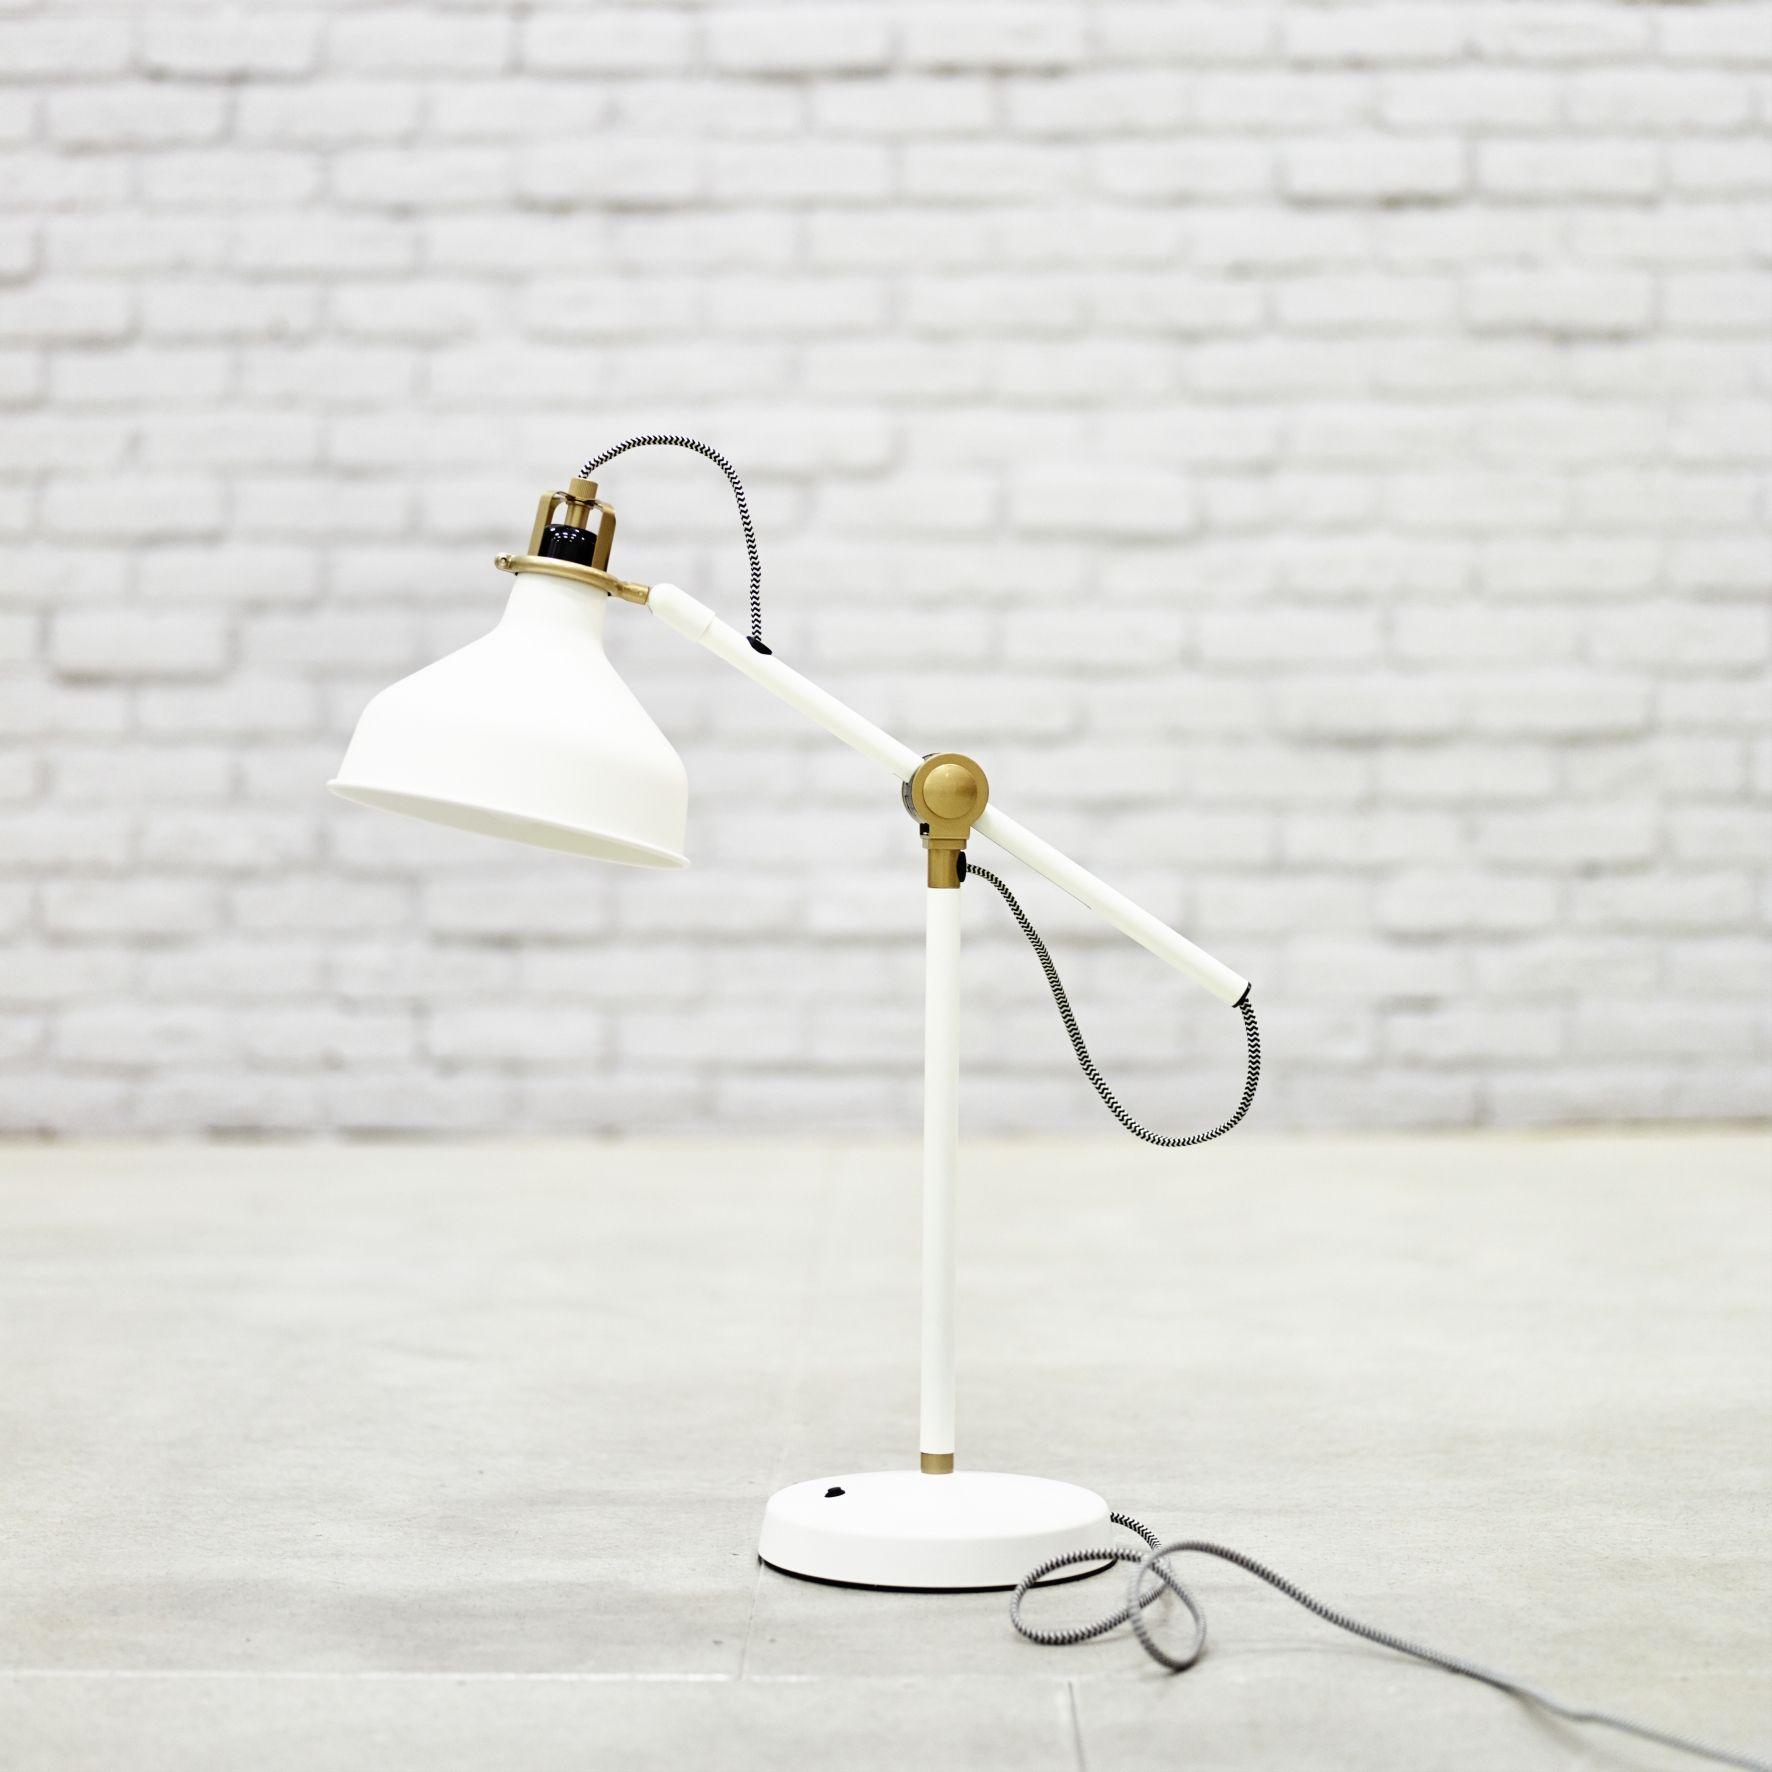 IKEA Ranarp desk lamp | Chic lighting, Industrial chic decor